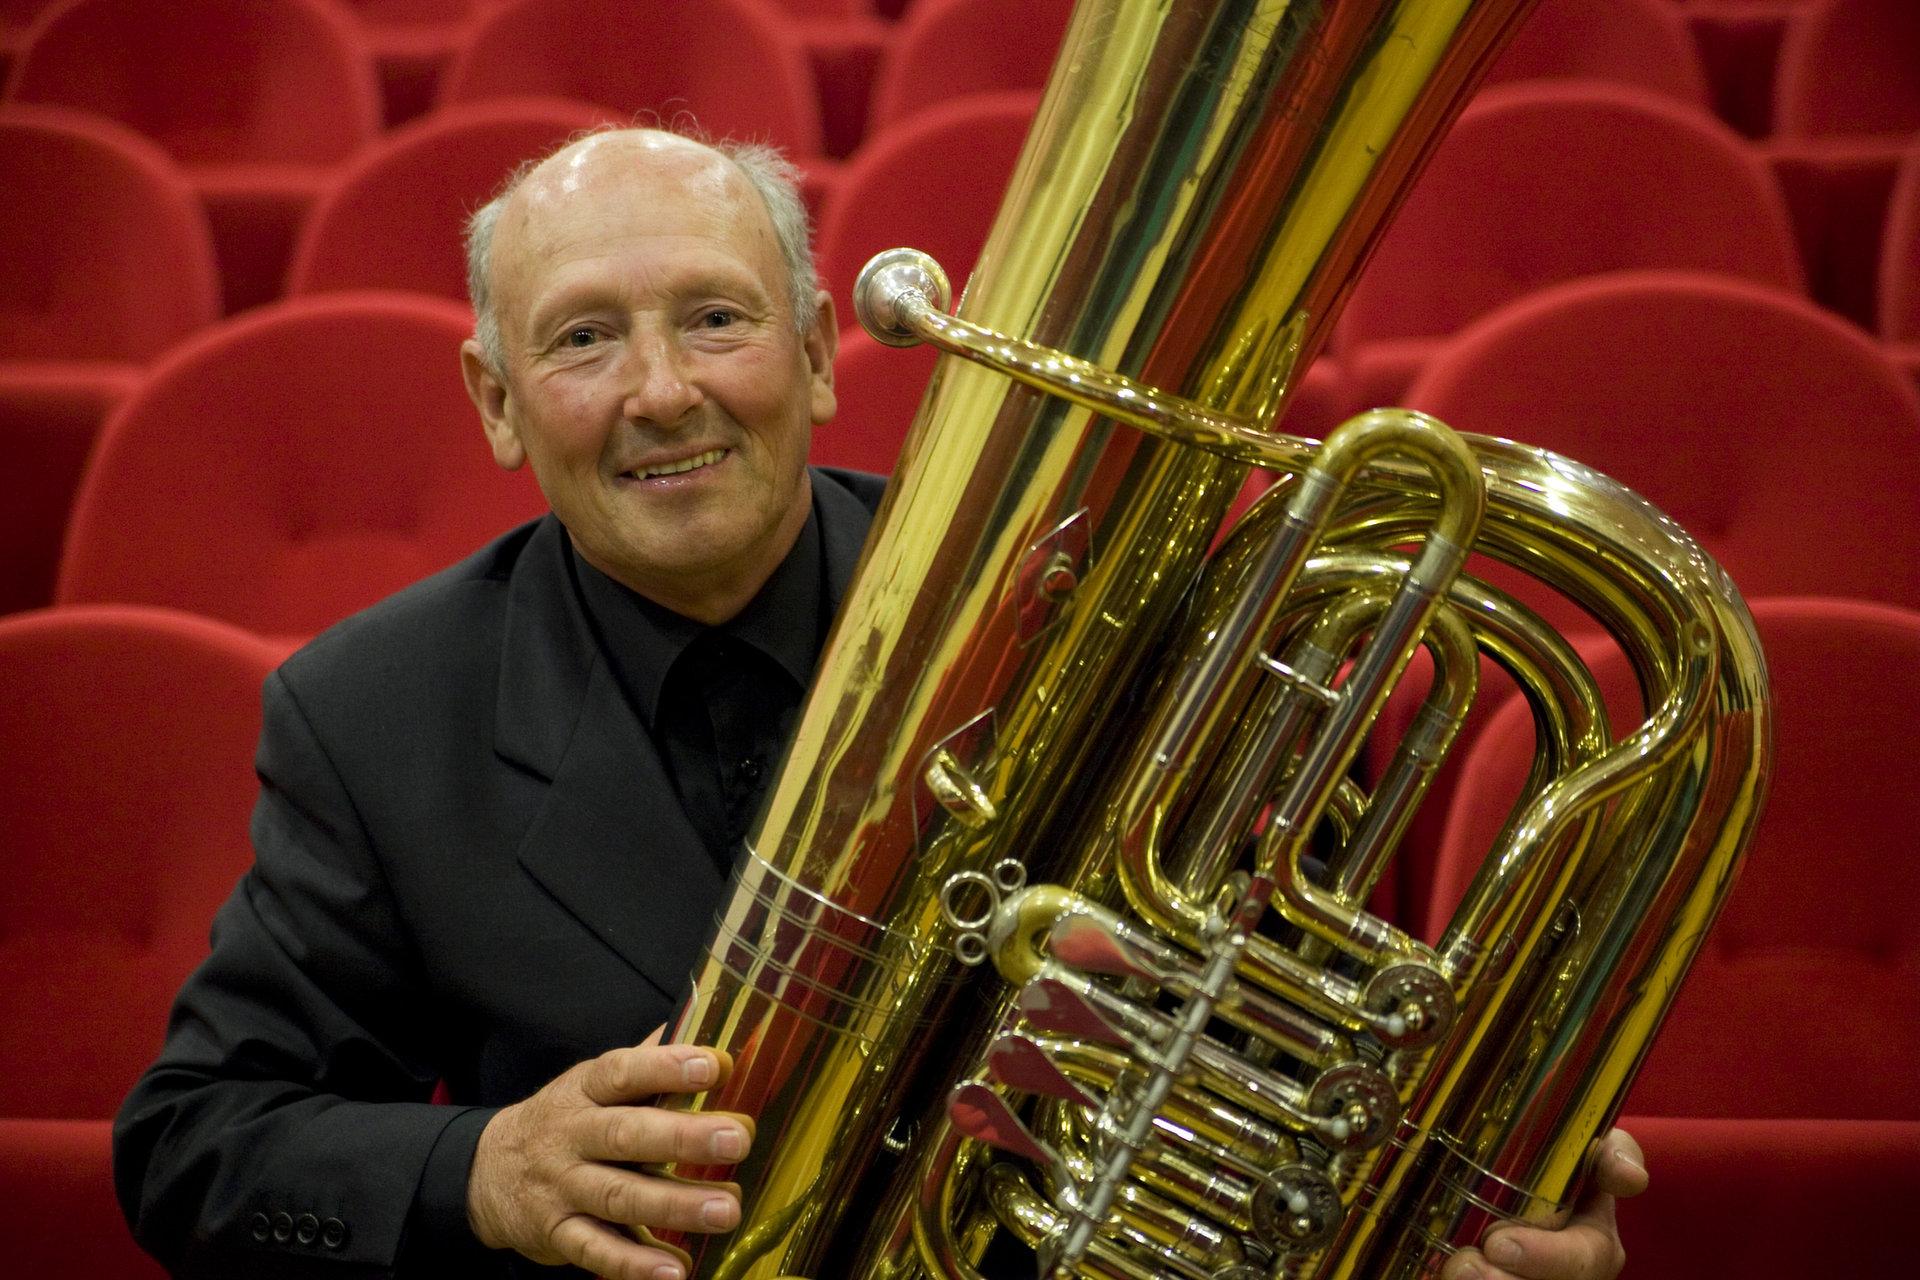 Carlo Lissandrin